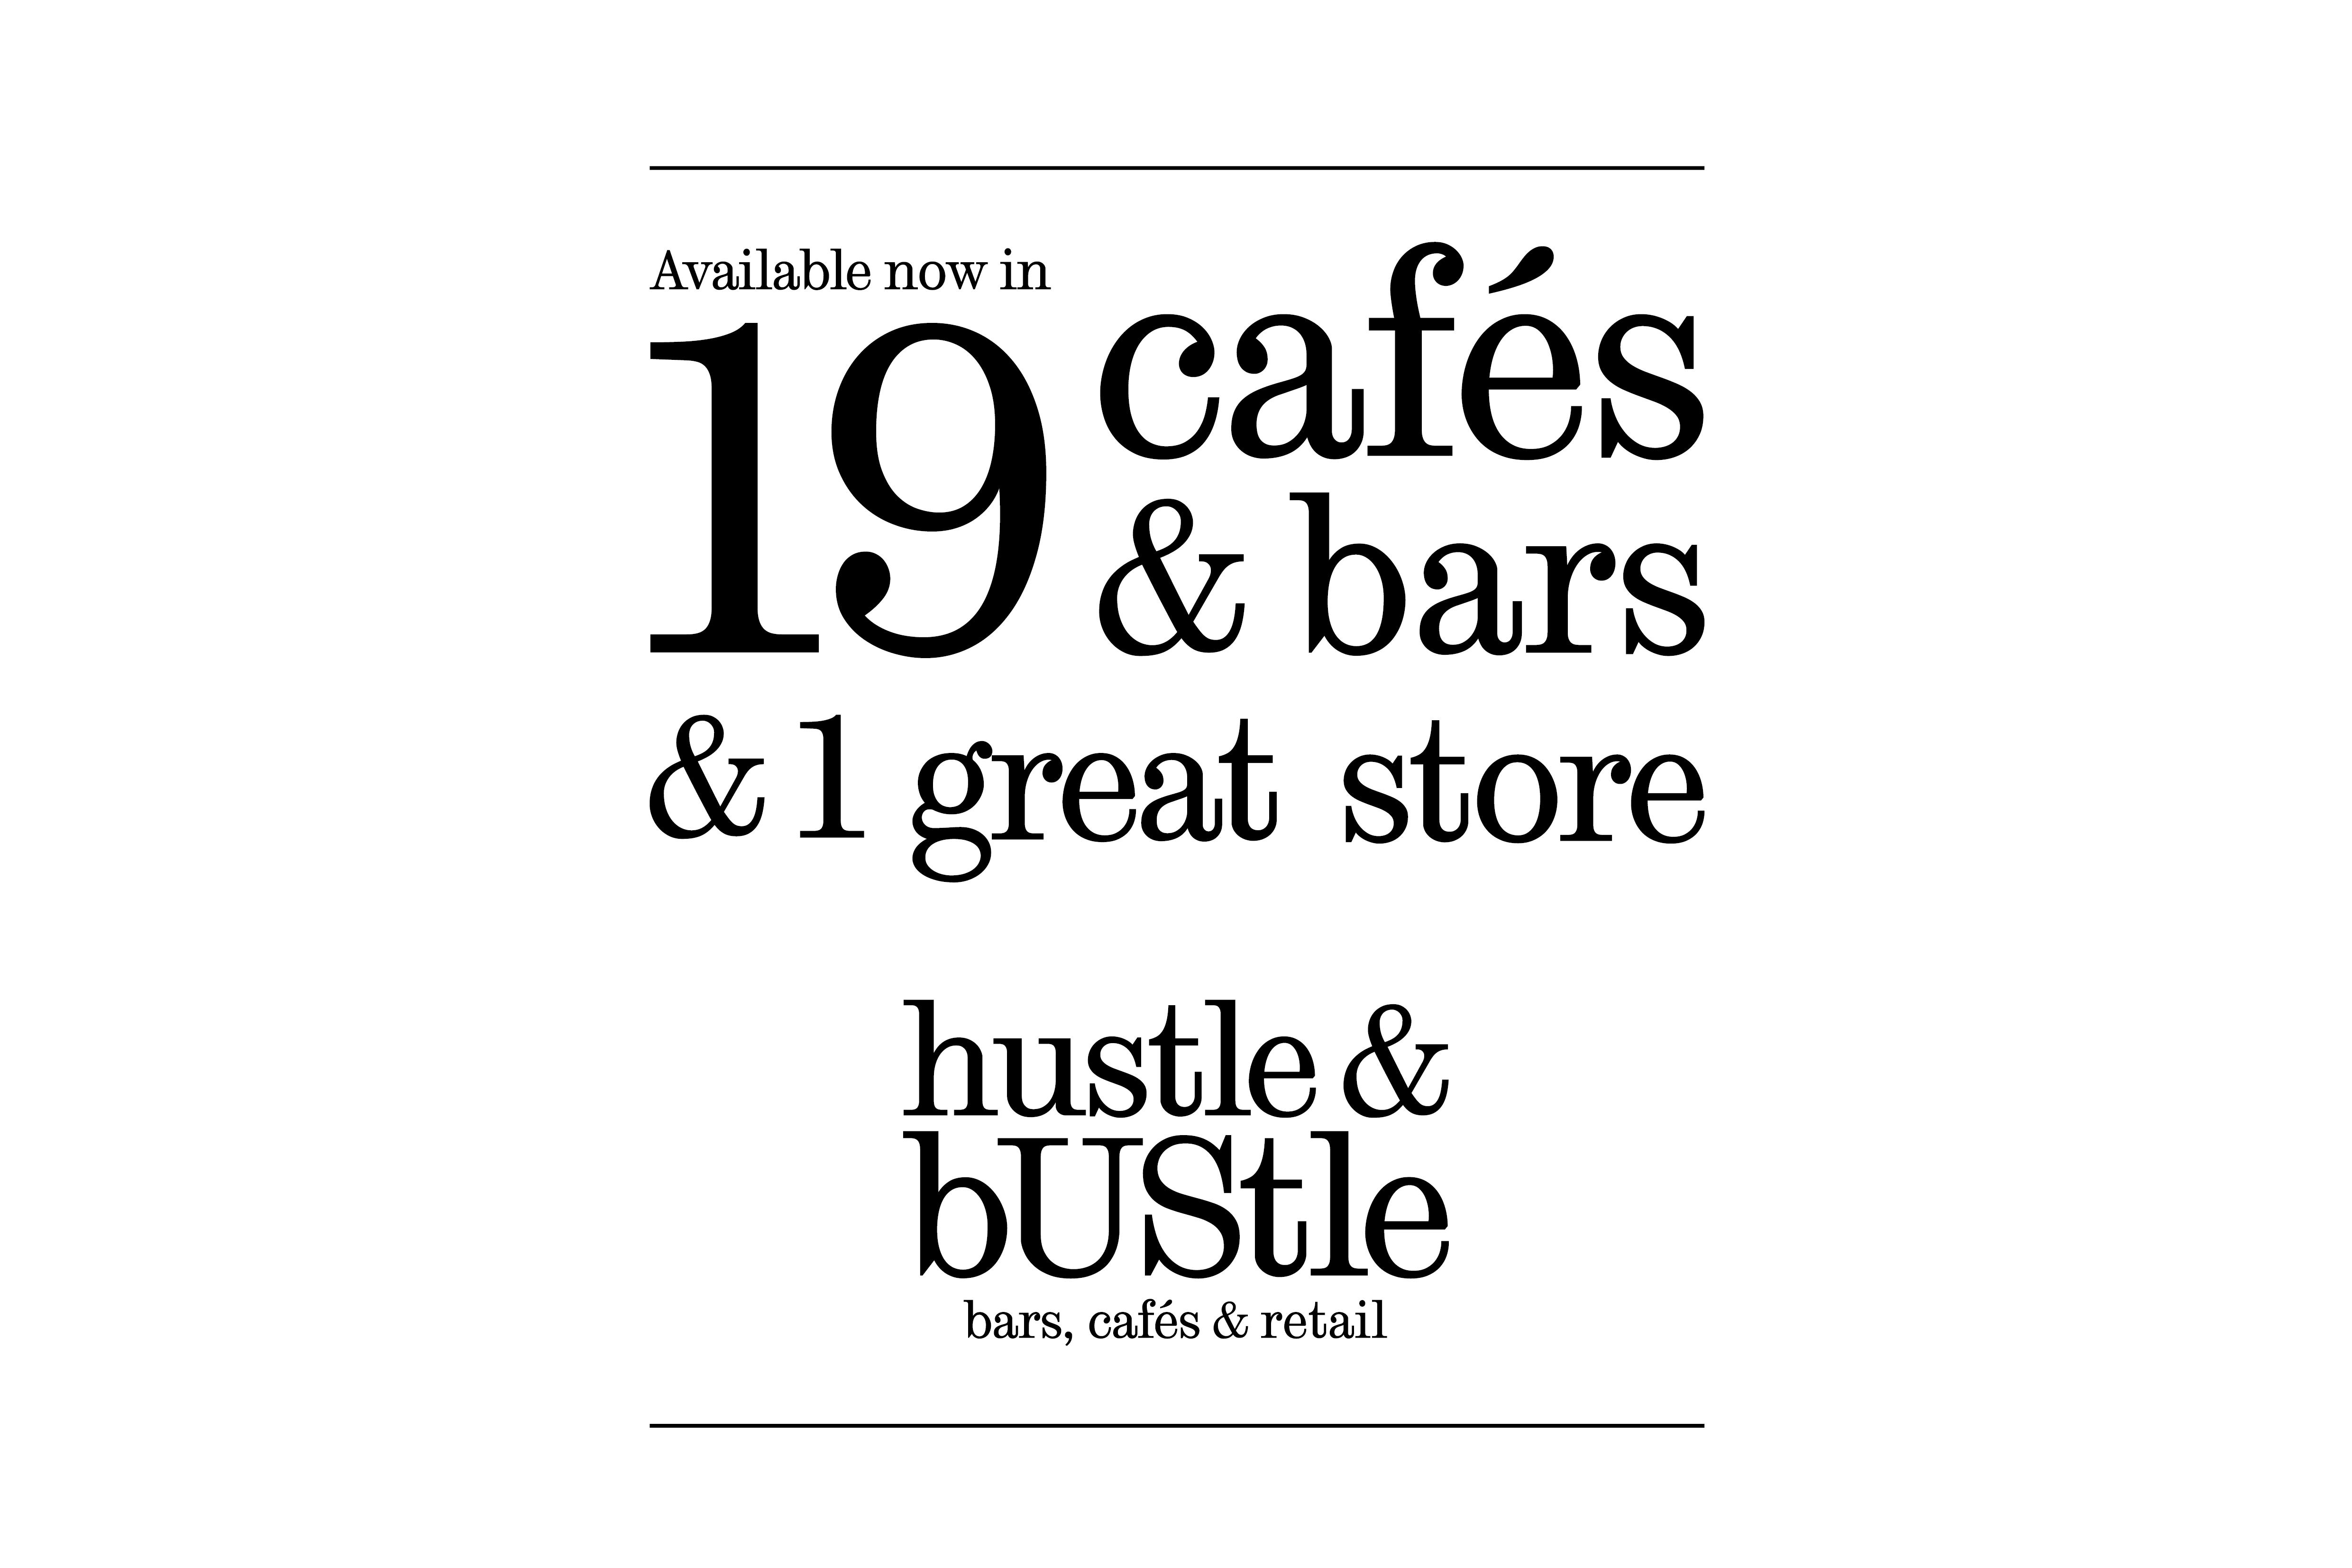 hustle & bUstle cafes & bars in Sheffield